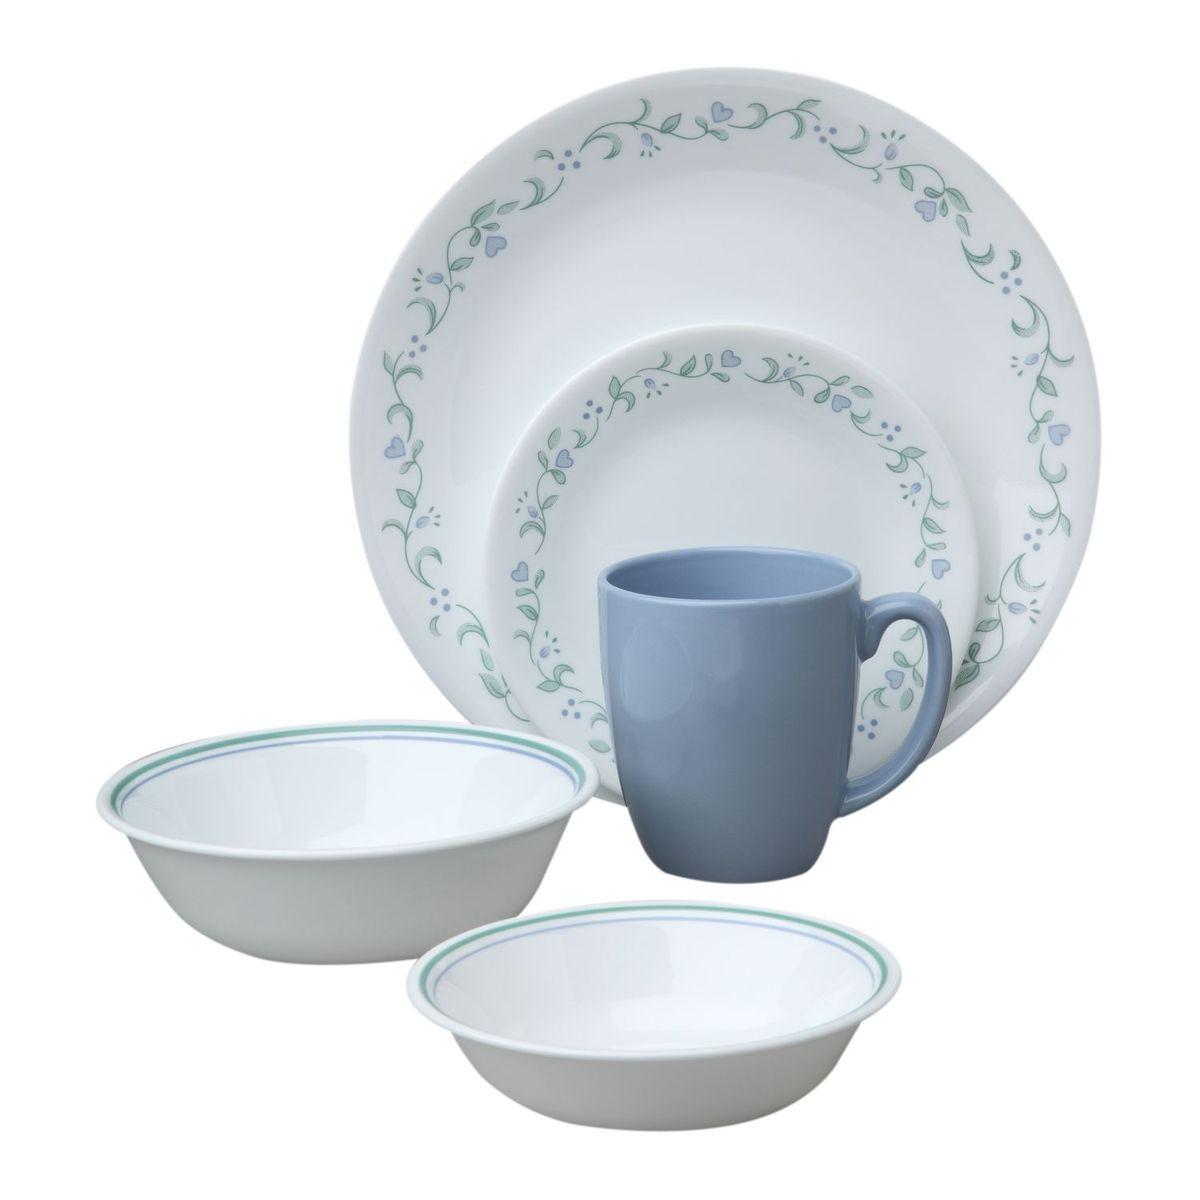 Набор посуды Corelle Country Cottage, цвет: белый, 18 предметов. 1114099